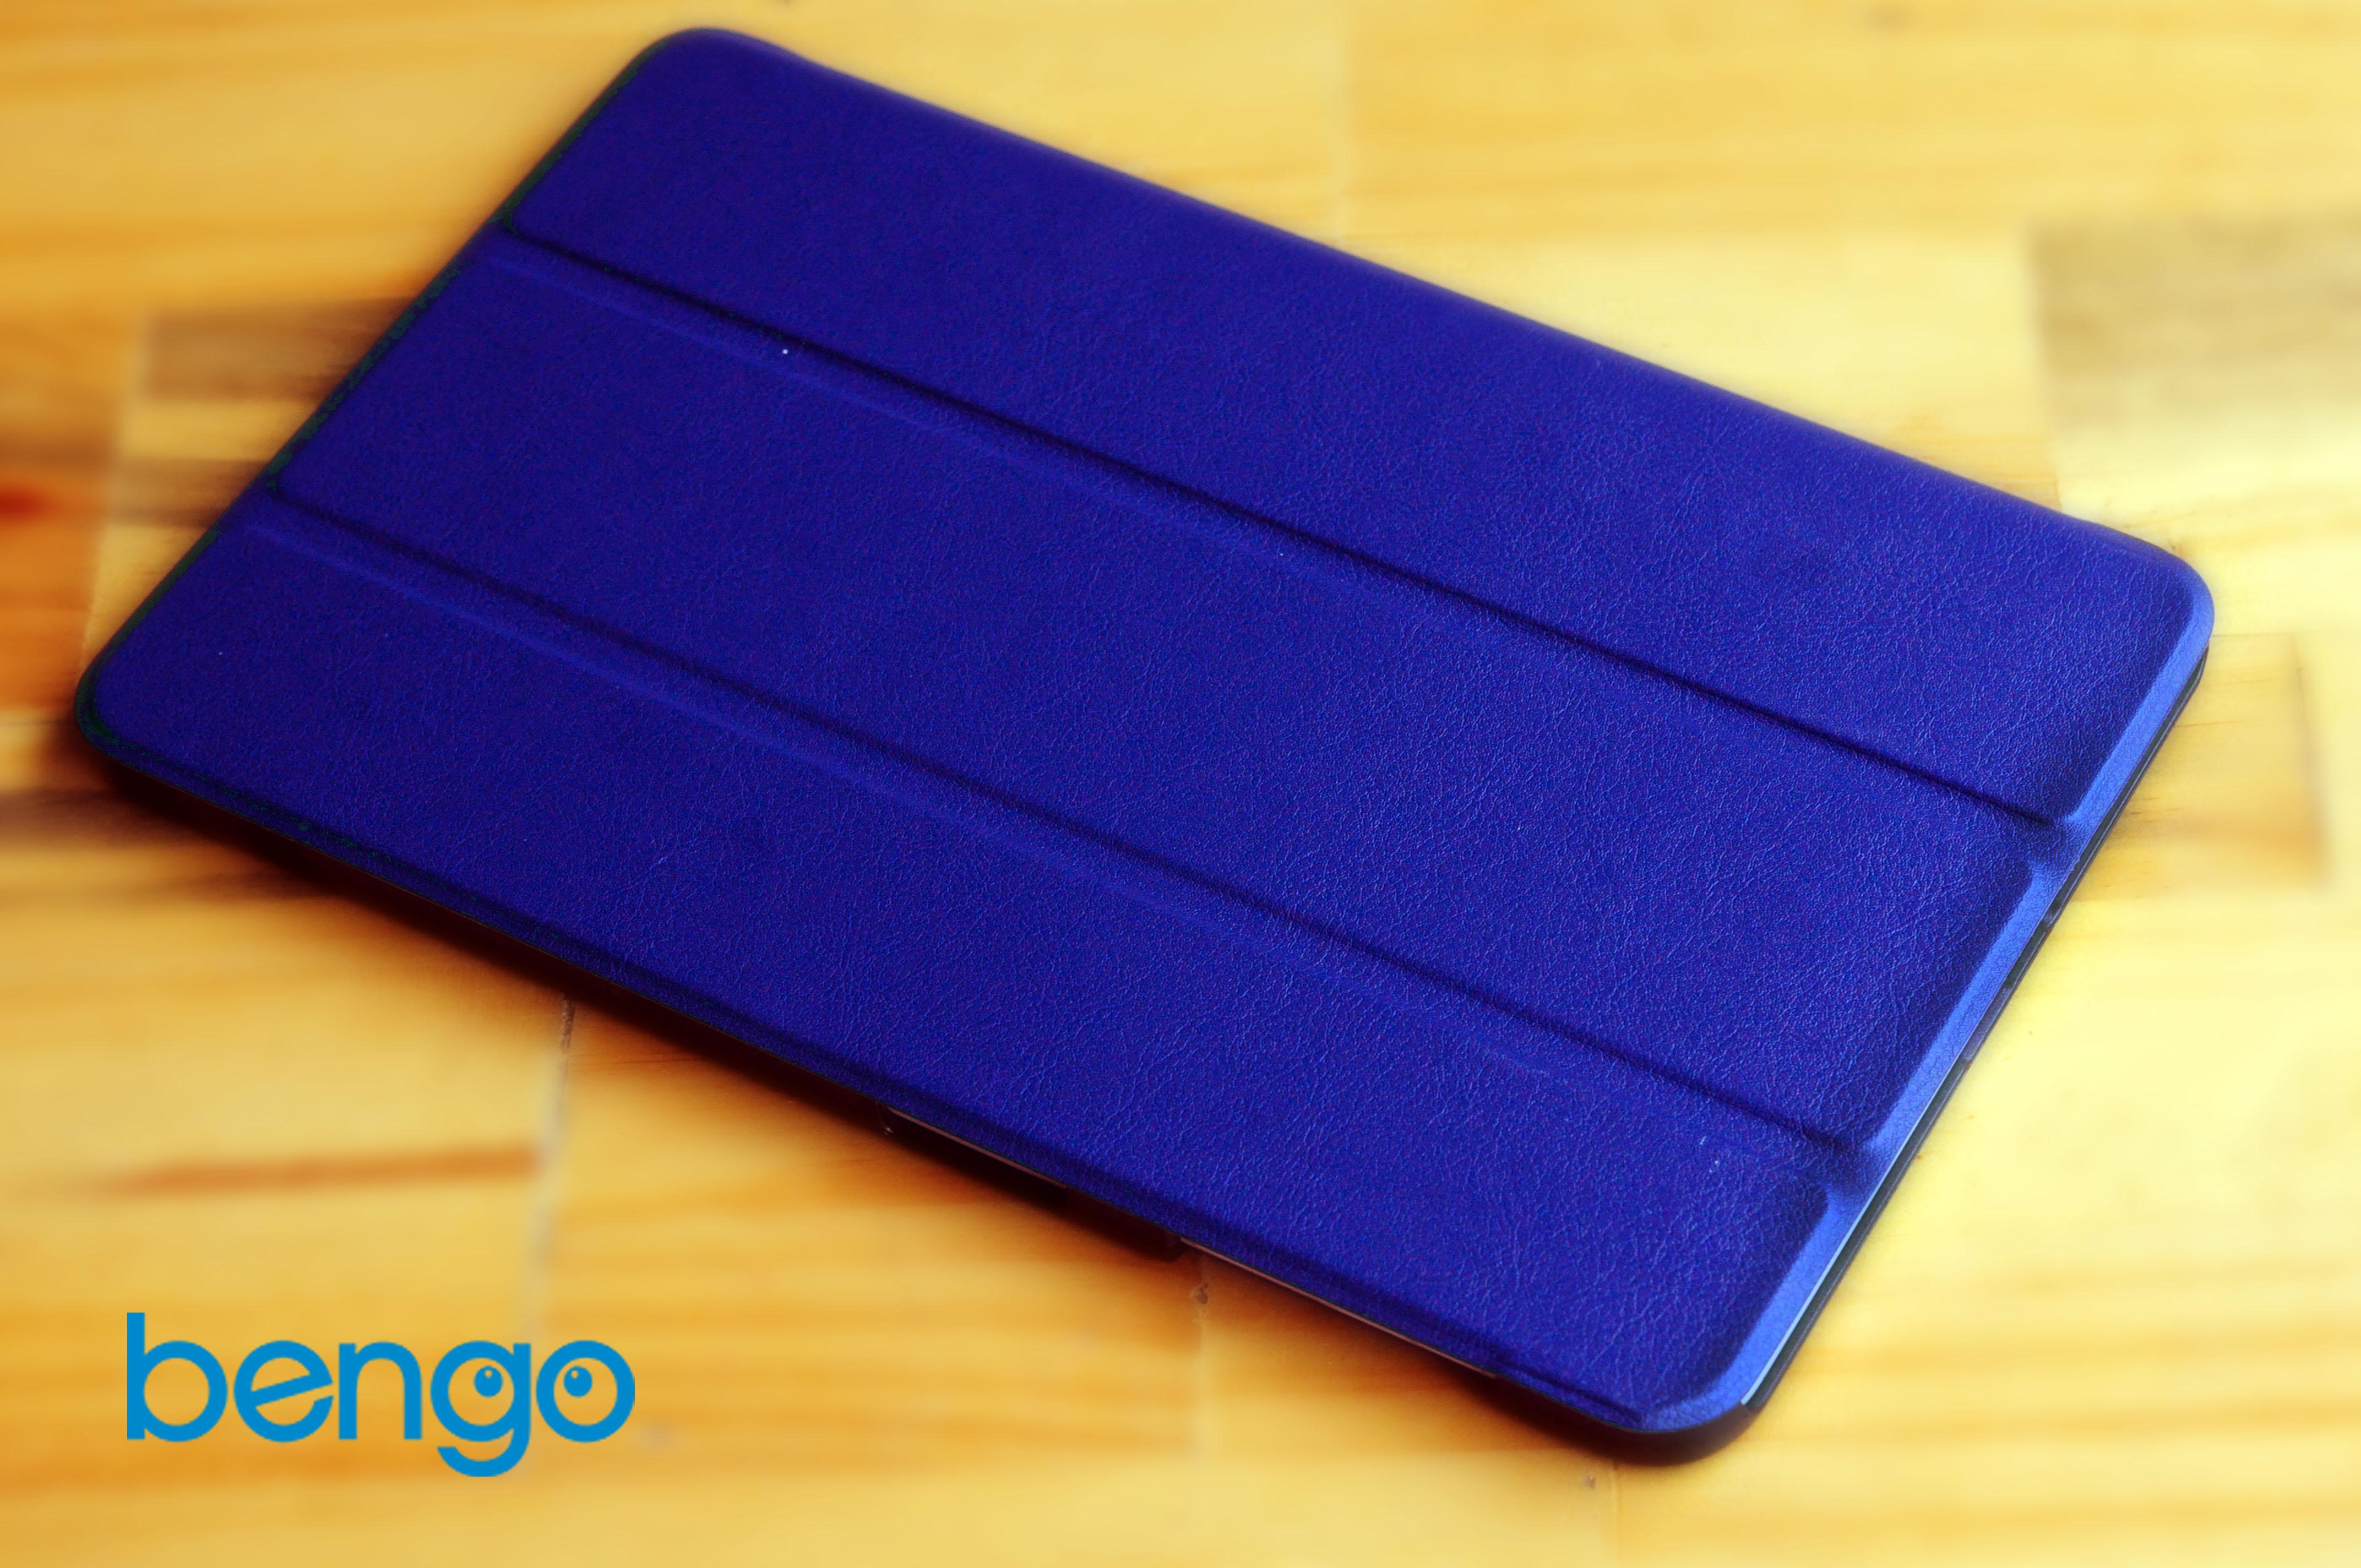 bao da samsung galaxy tab a6 10.1 t580/t585 smartcover